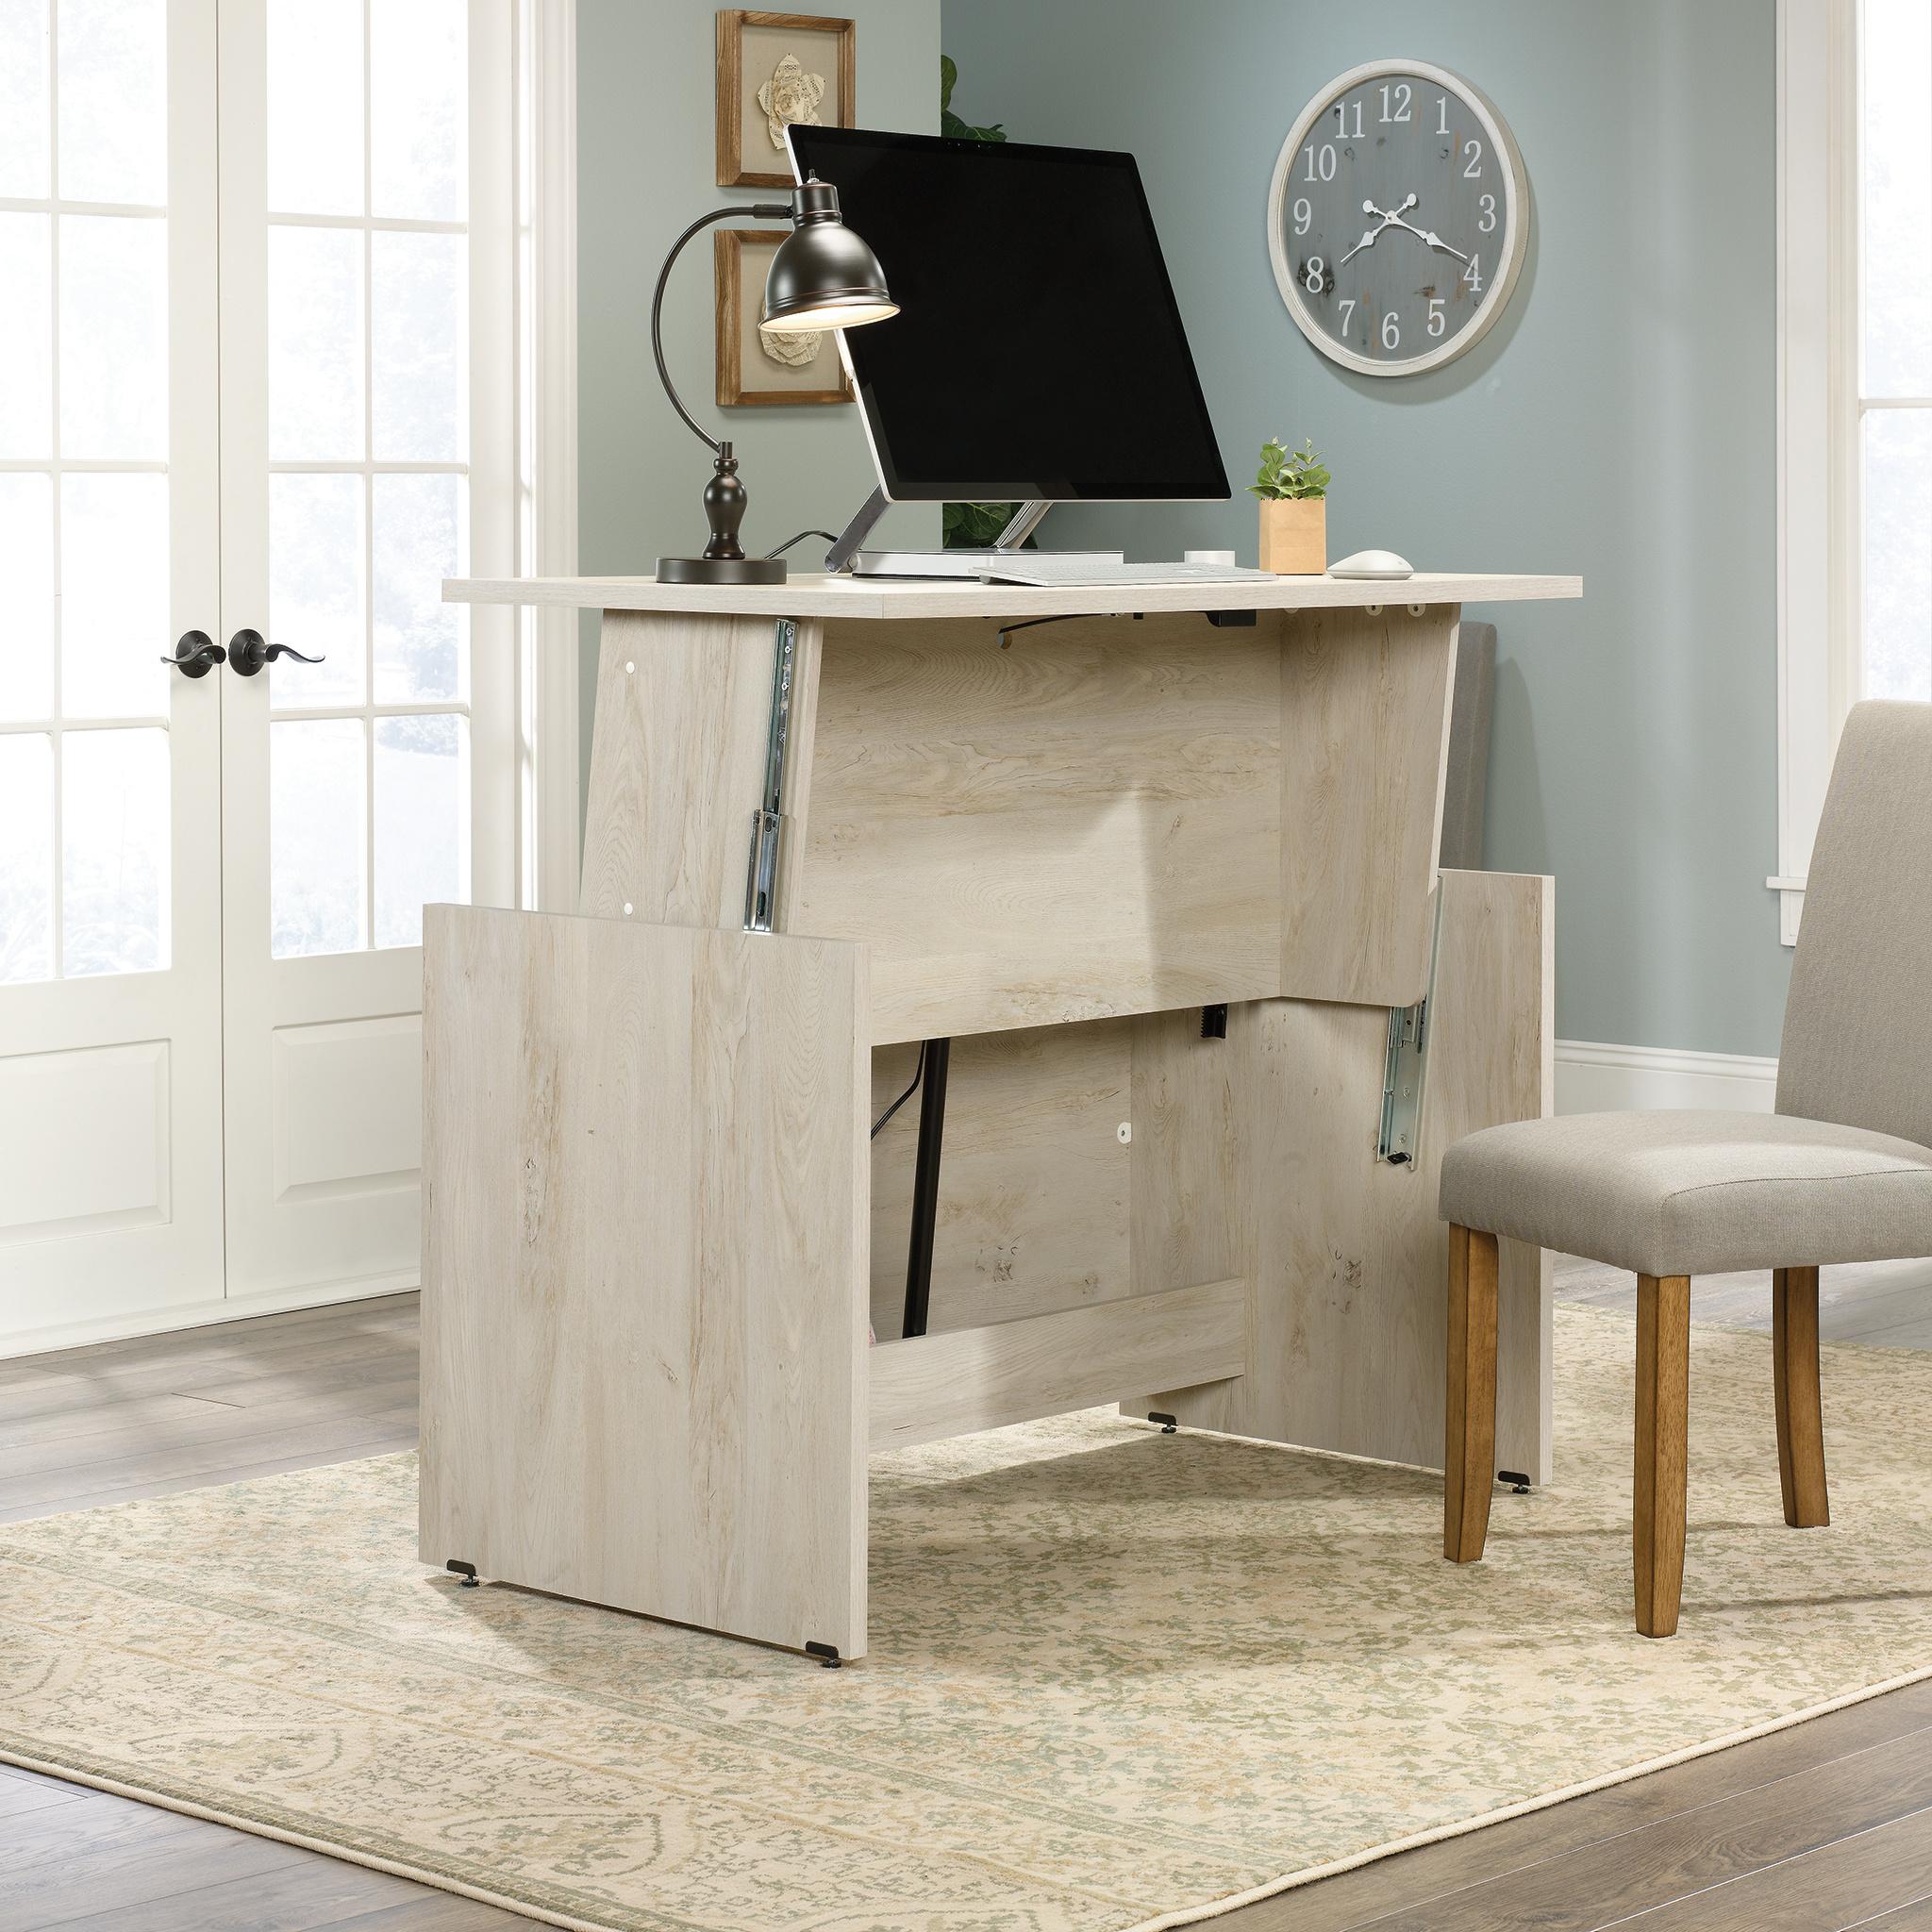 Sauder Costa Sit Stand Desk 422407 Sauder The Furniture Co